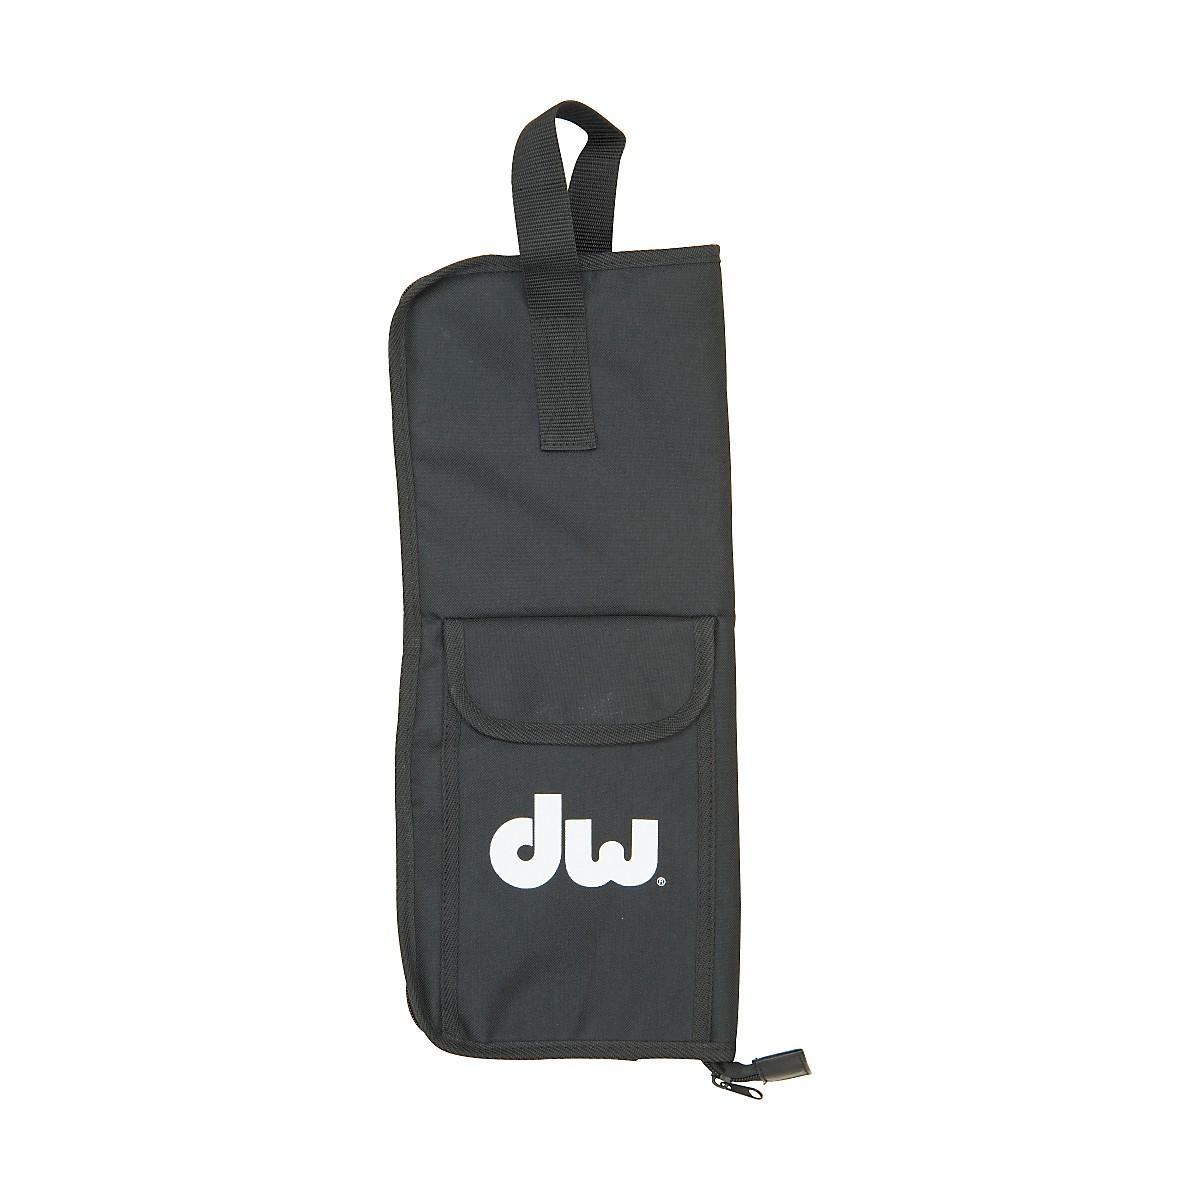 DW Padded Stick Bag